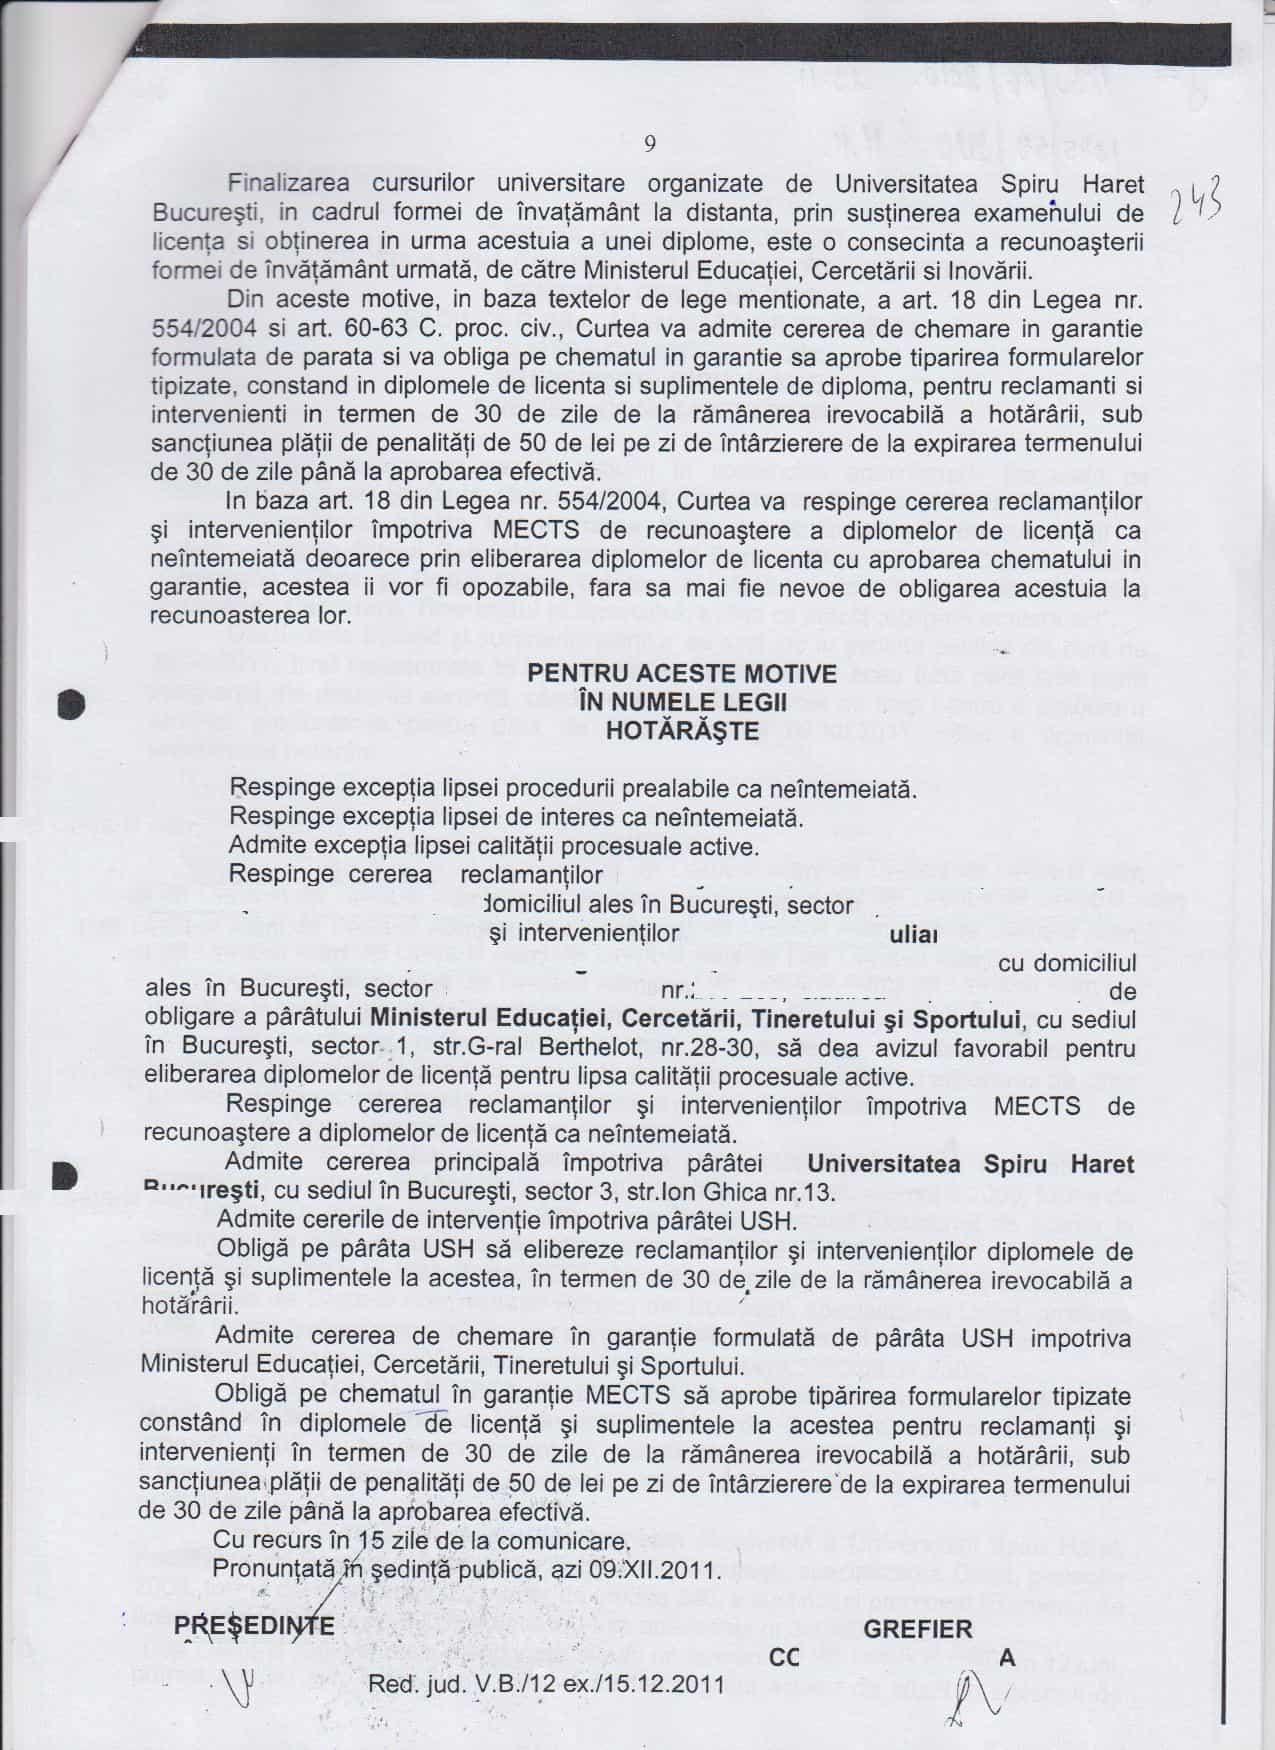 hotarare-ush-restituirea-diplomelor-ush-hotarare-castigata[1]